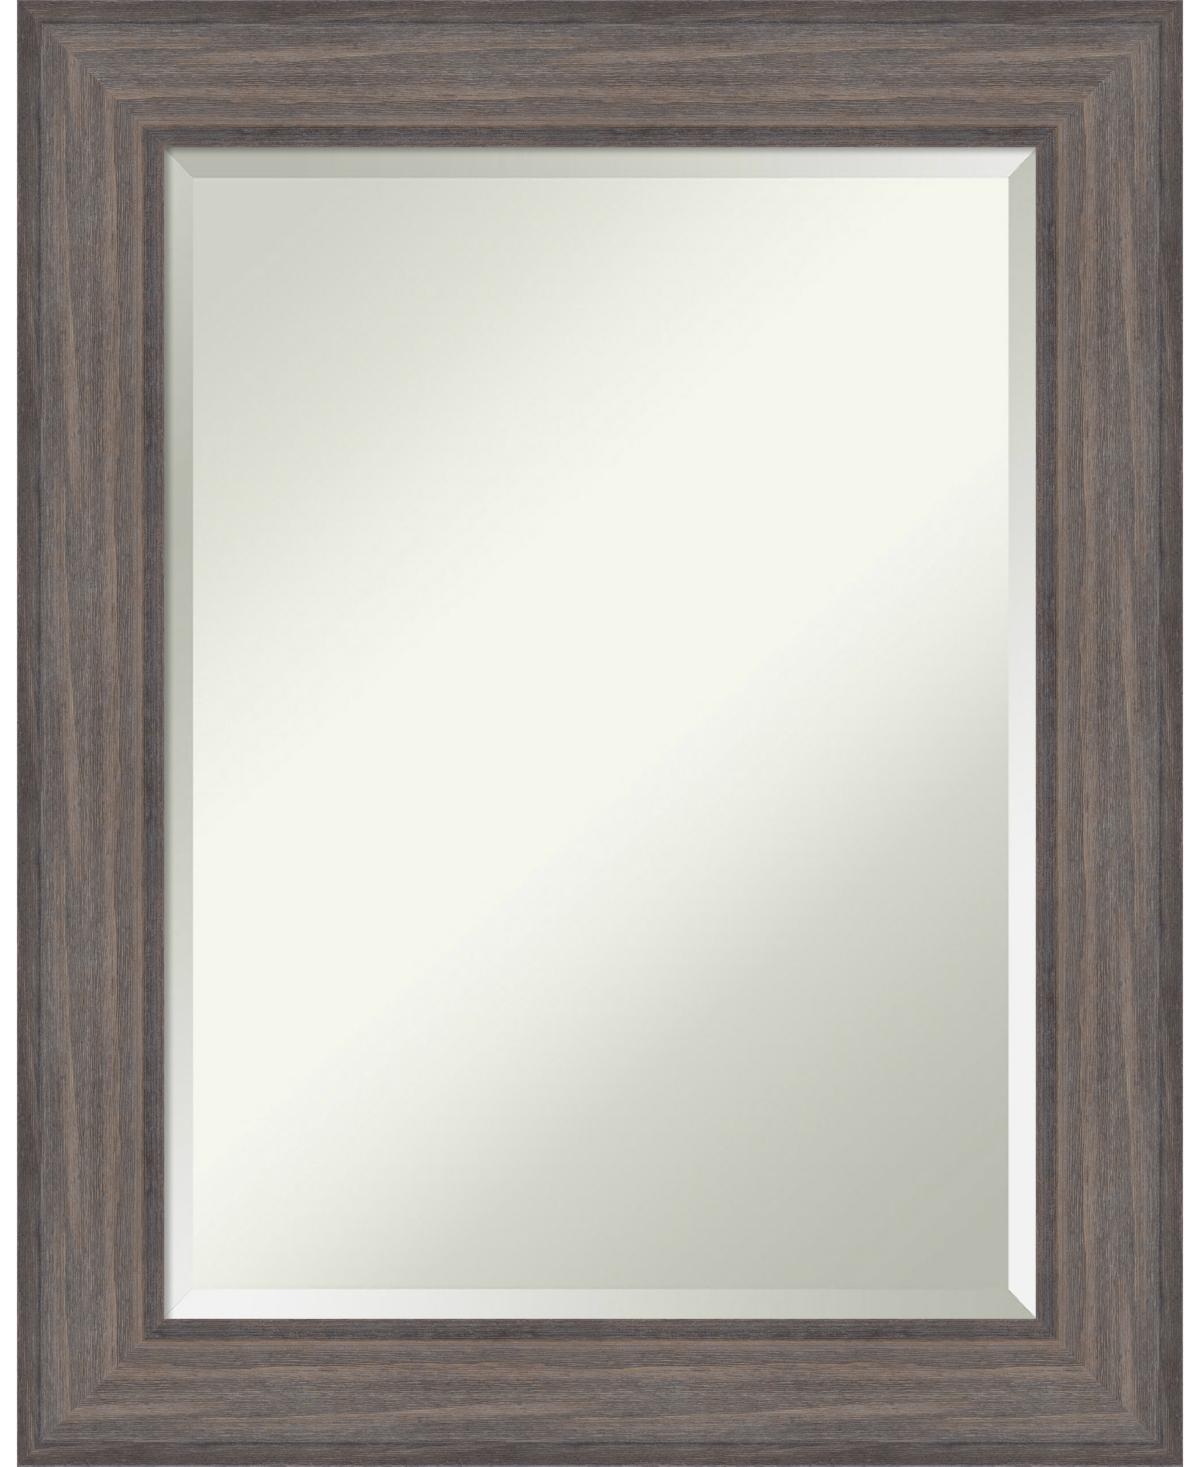 Amanti Art Country Barnwood 23x29 Bathroom Mirror